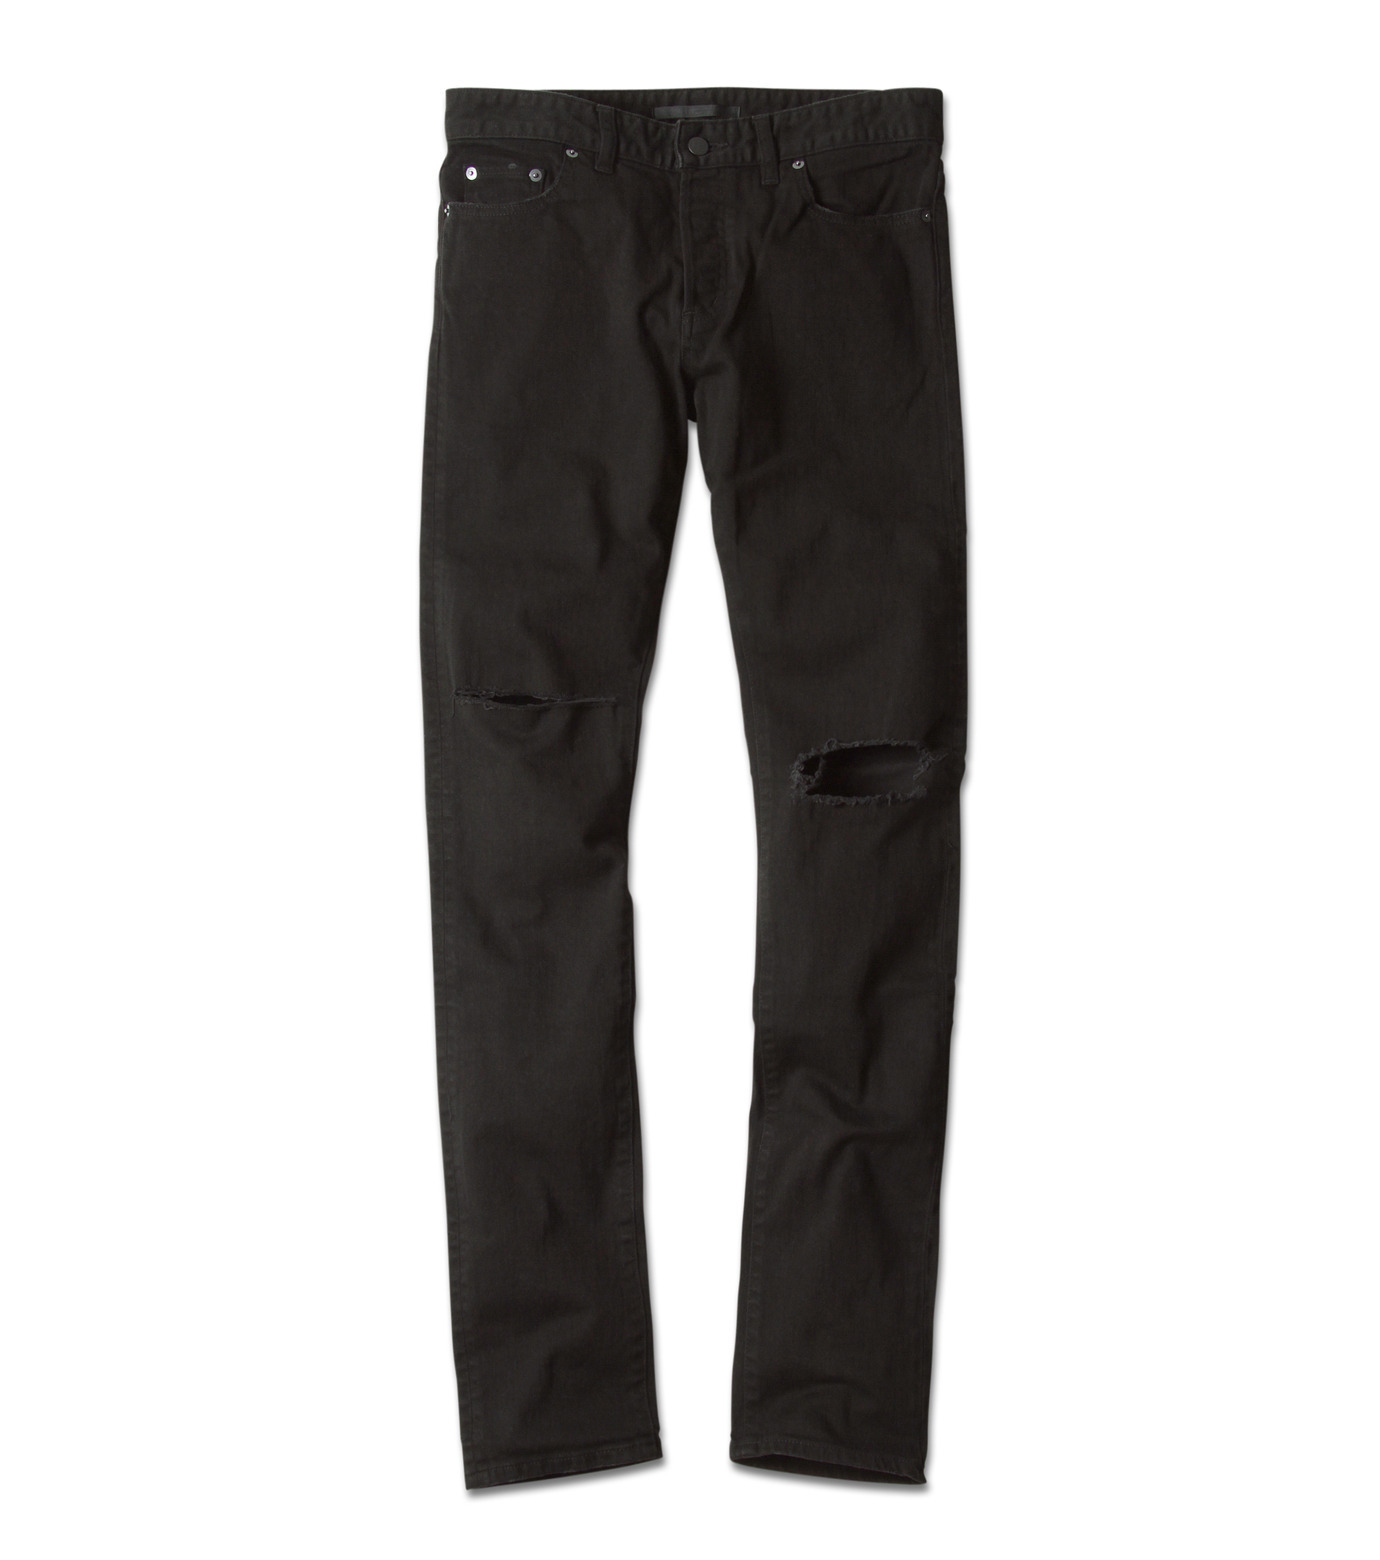 HL HEDDIE LOVU(エイチエル・エディールーヴ)のBlack Damage2 Sk-BLACK(パンツ/pants)-17A98004-13 拡大詳細画像4